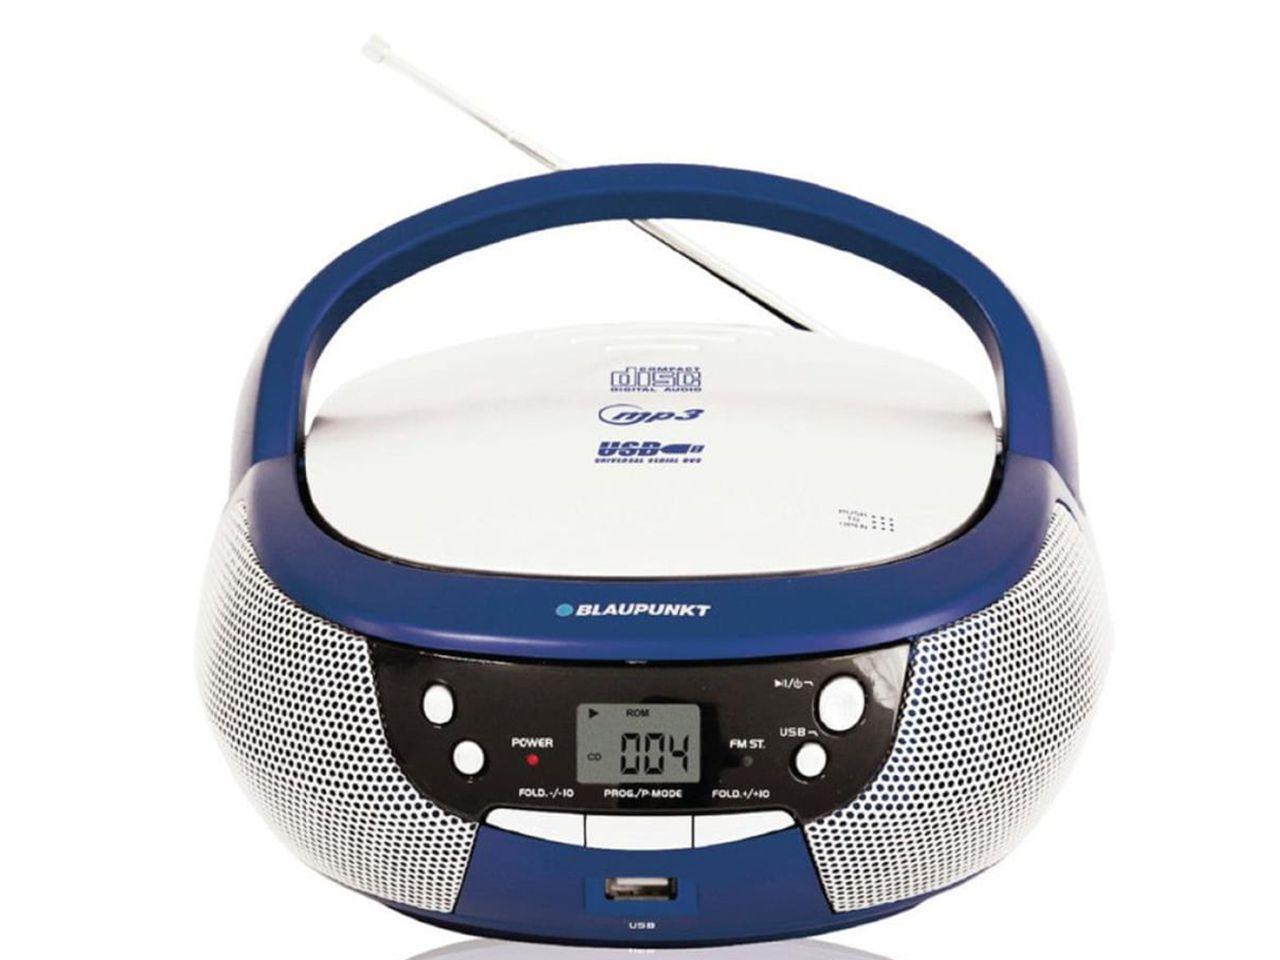 CD přehrávač BLAUPUNKT Boombox s CD a USB, modrý